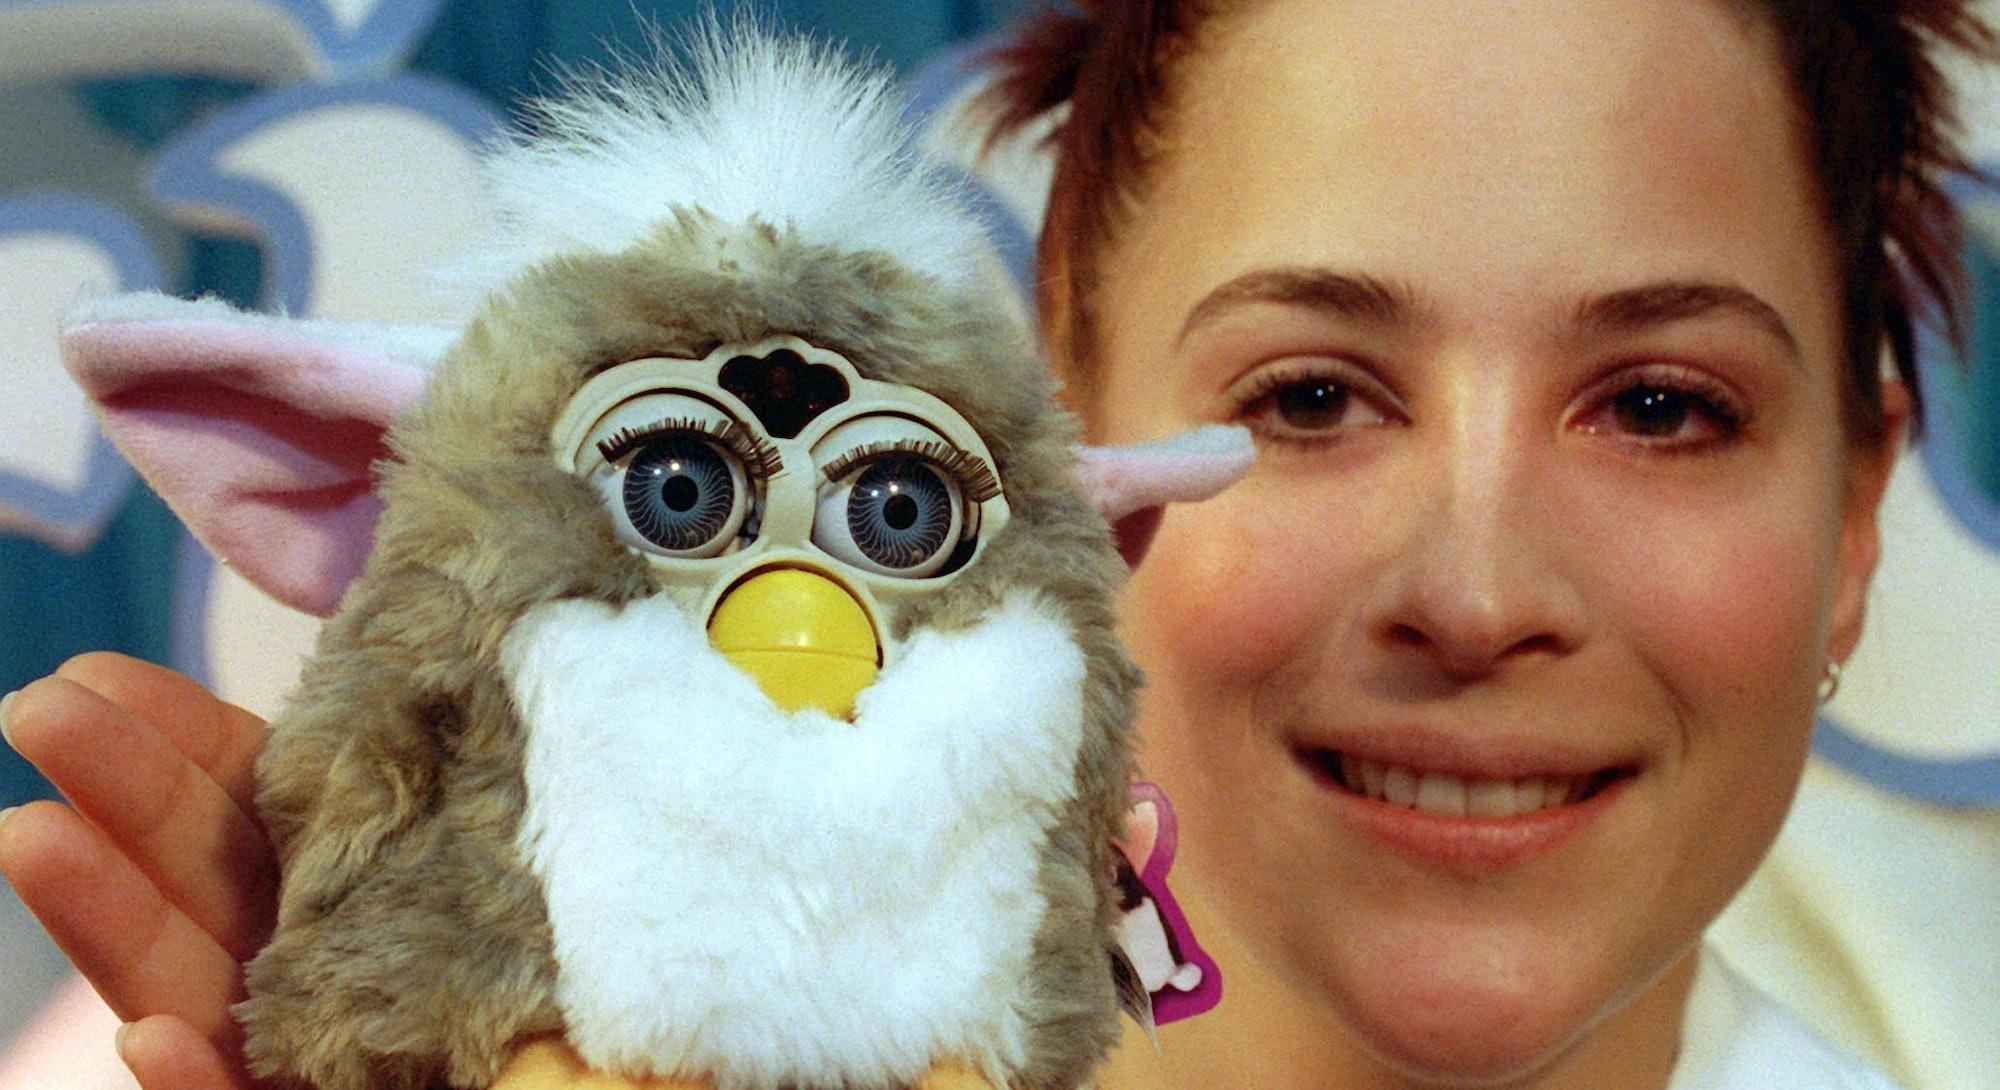 A woman holding a Furby